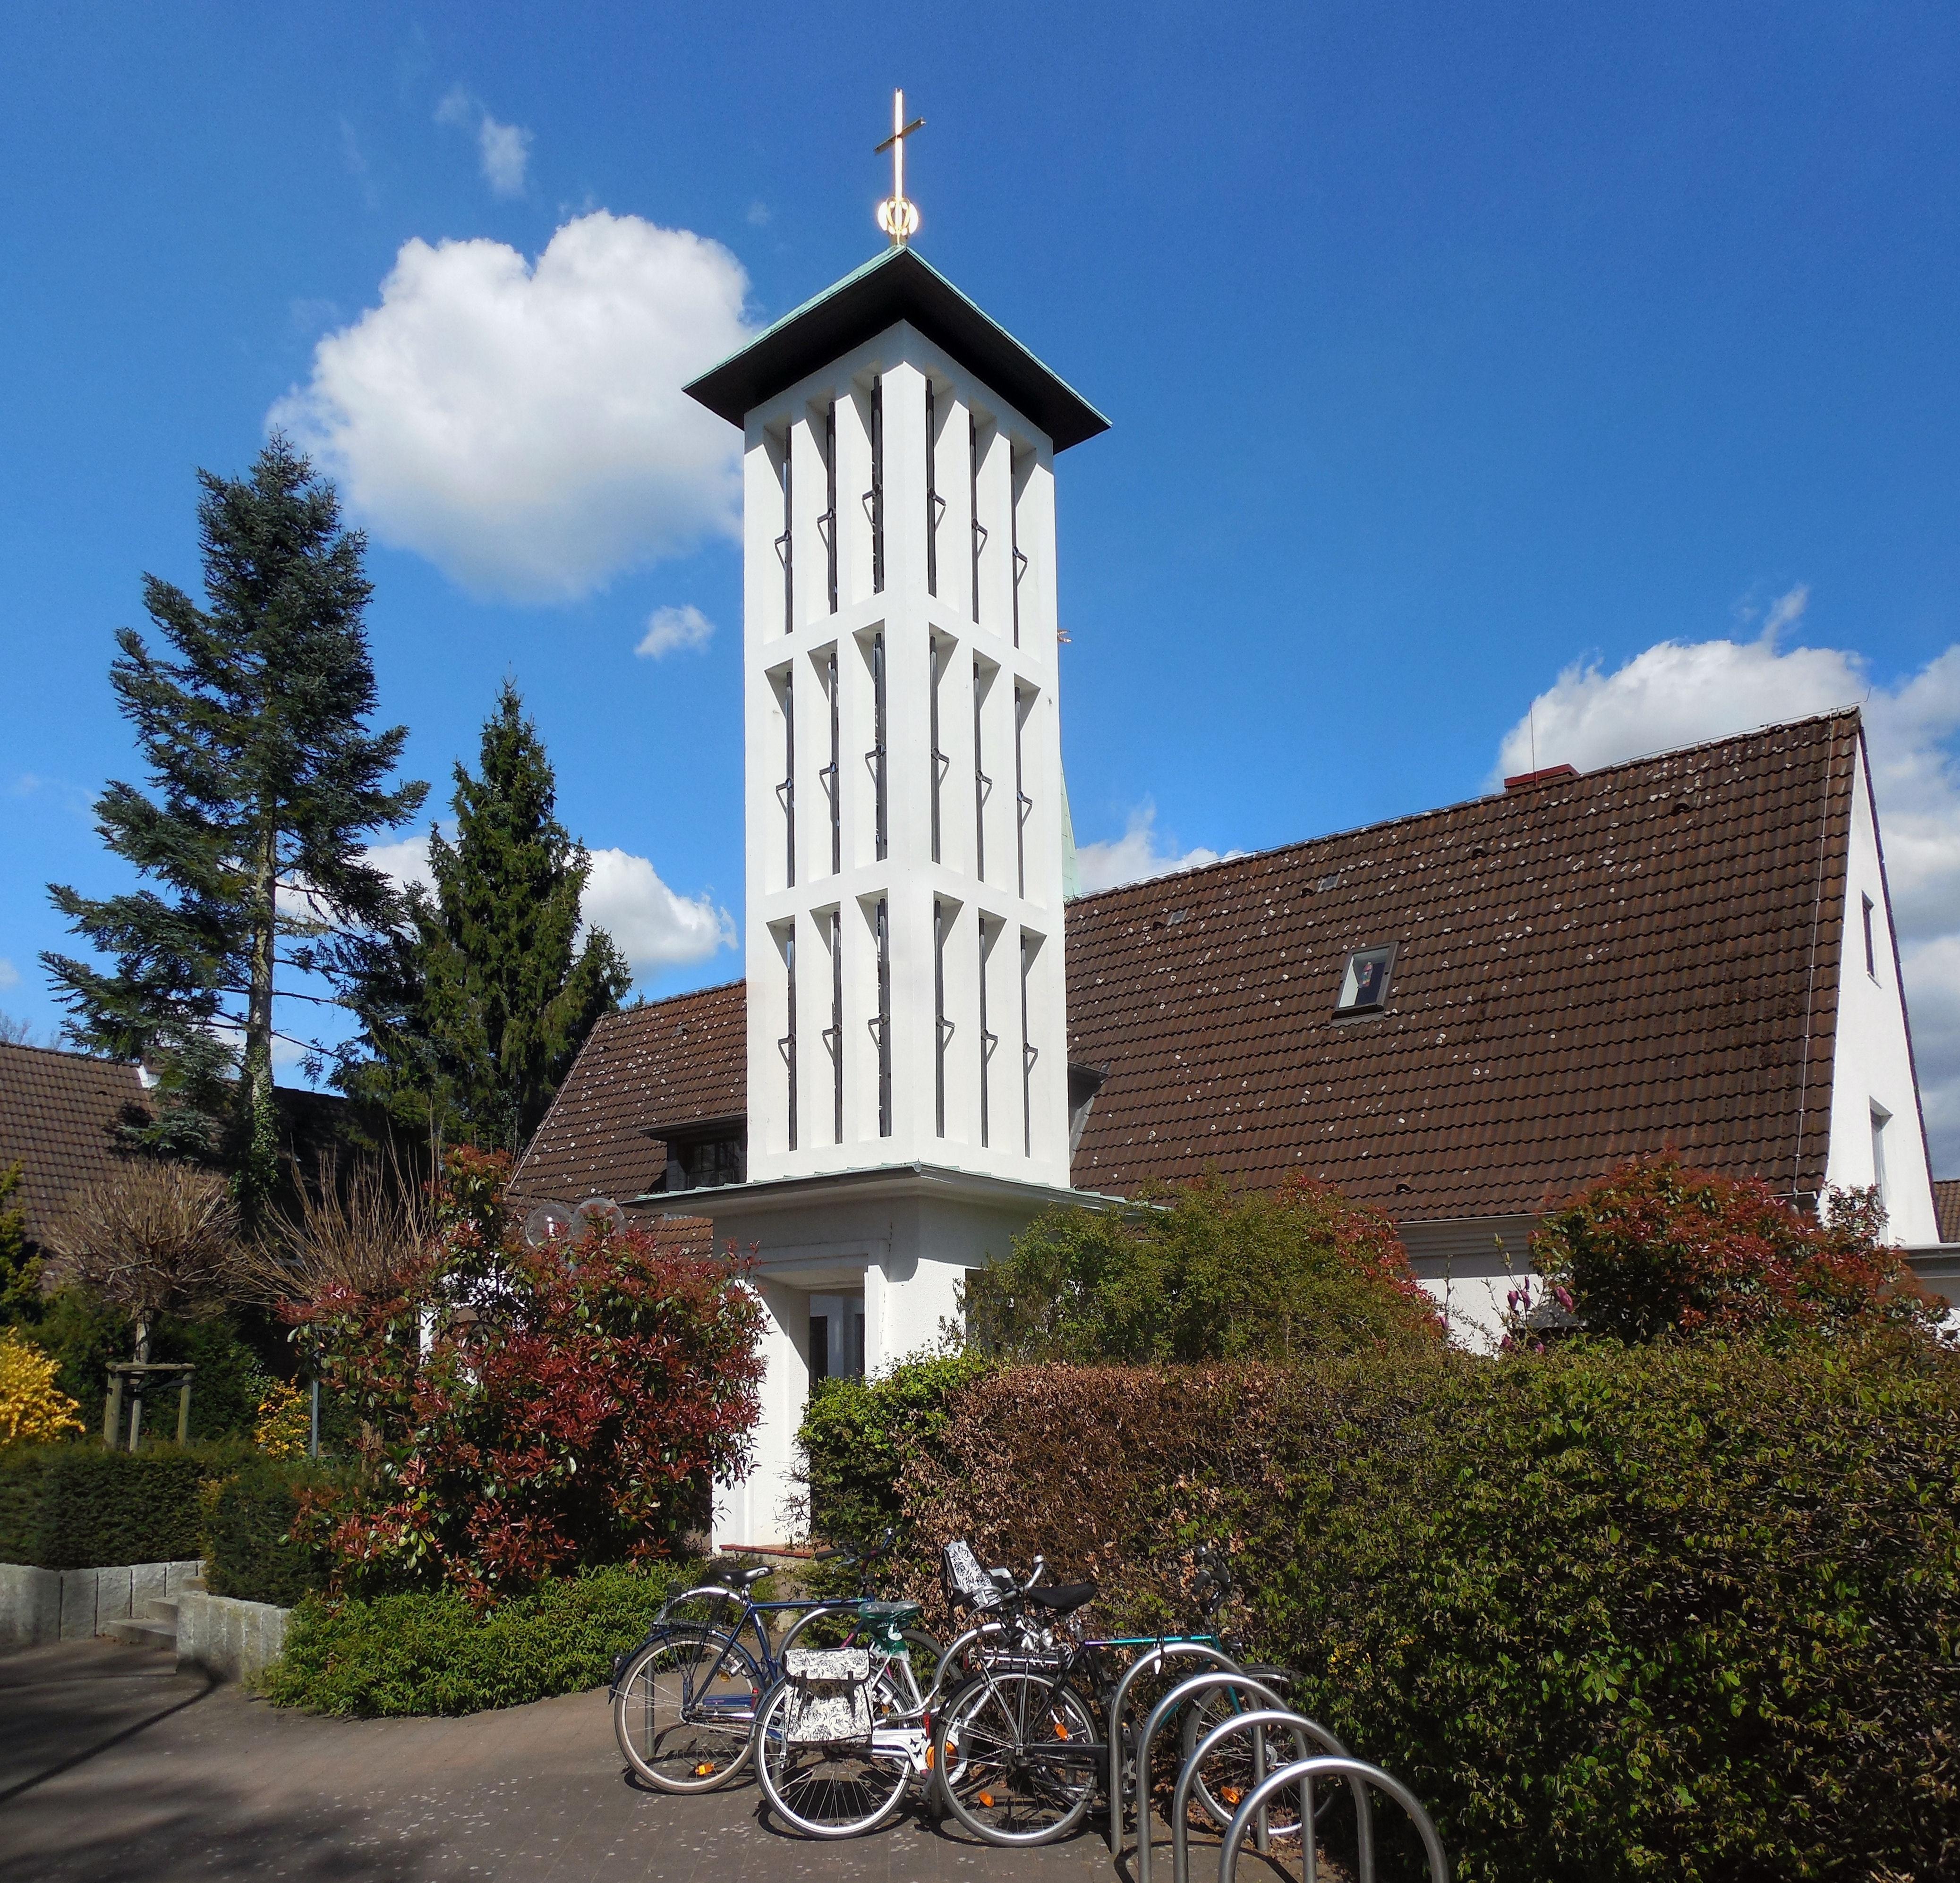 File:Wentorf, 21465 Wentorf bei Hamburg, Germany